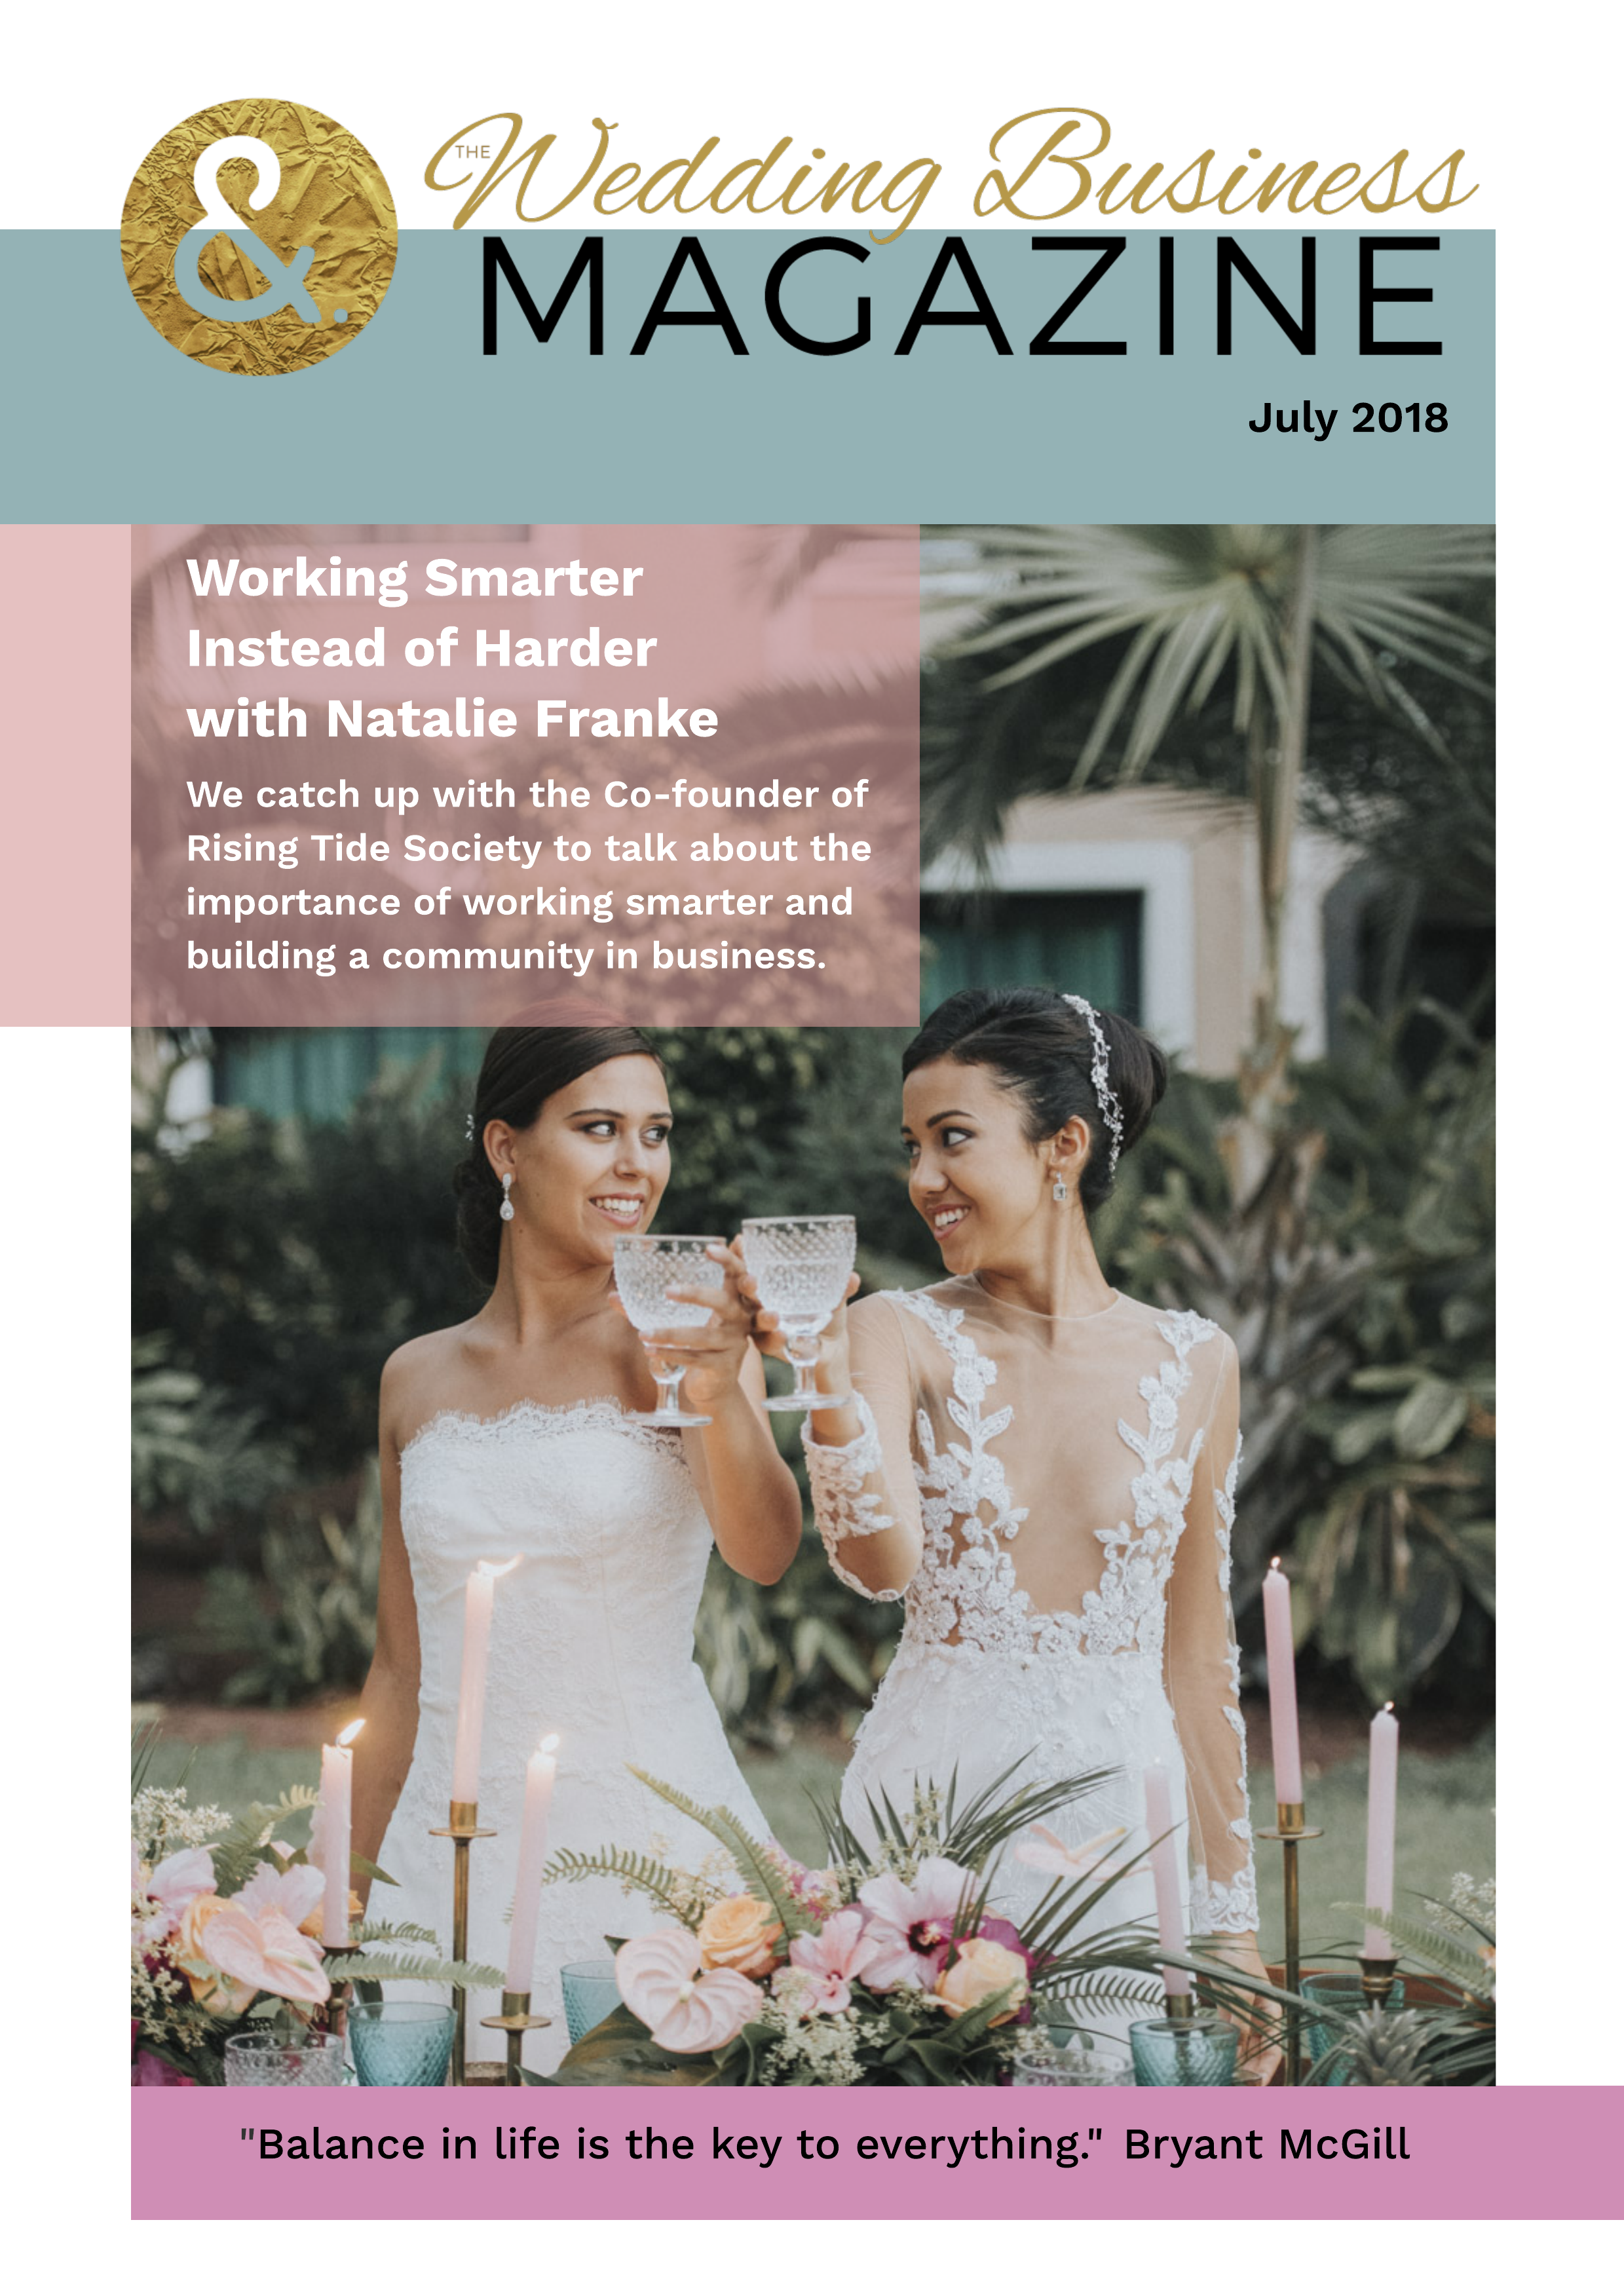 WedBizMag July 2018_Cover